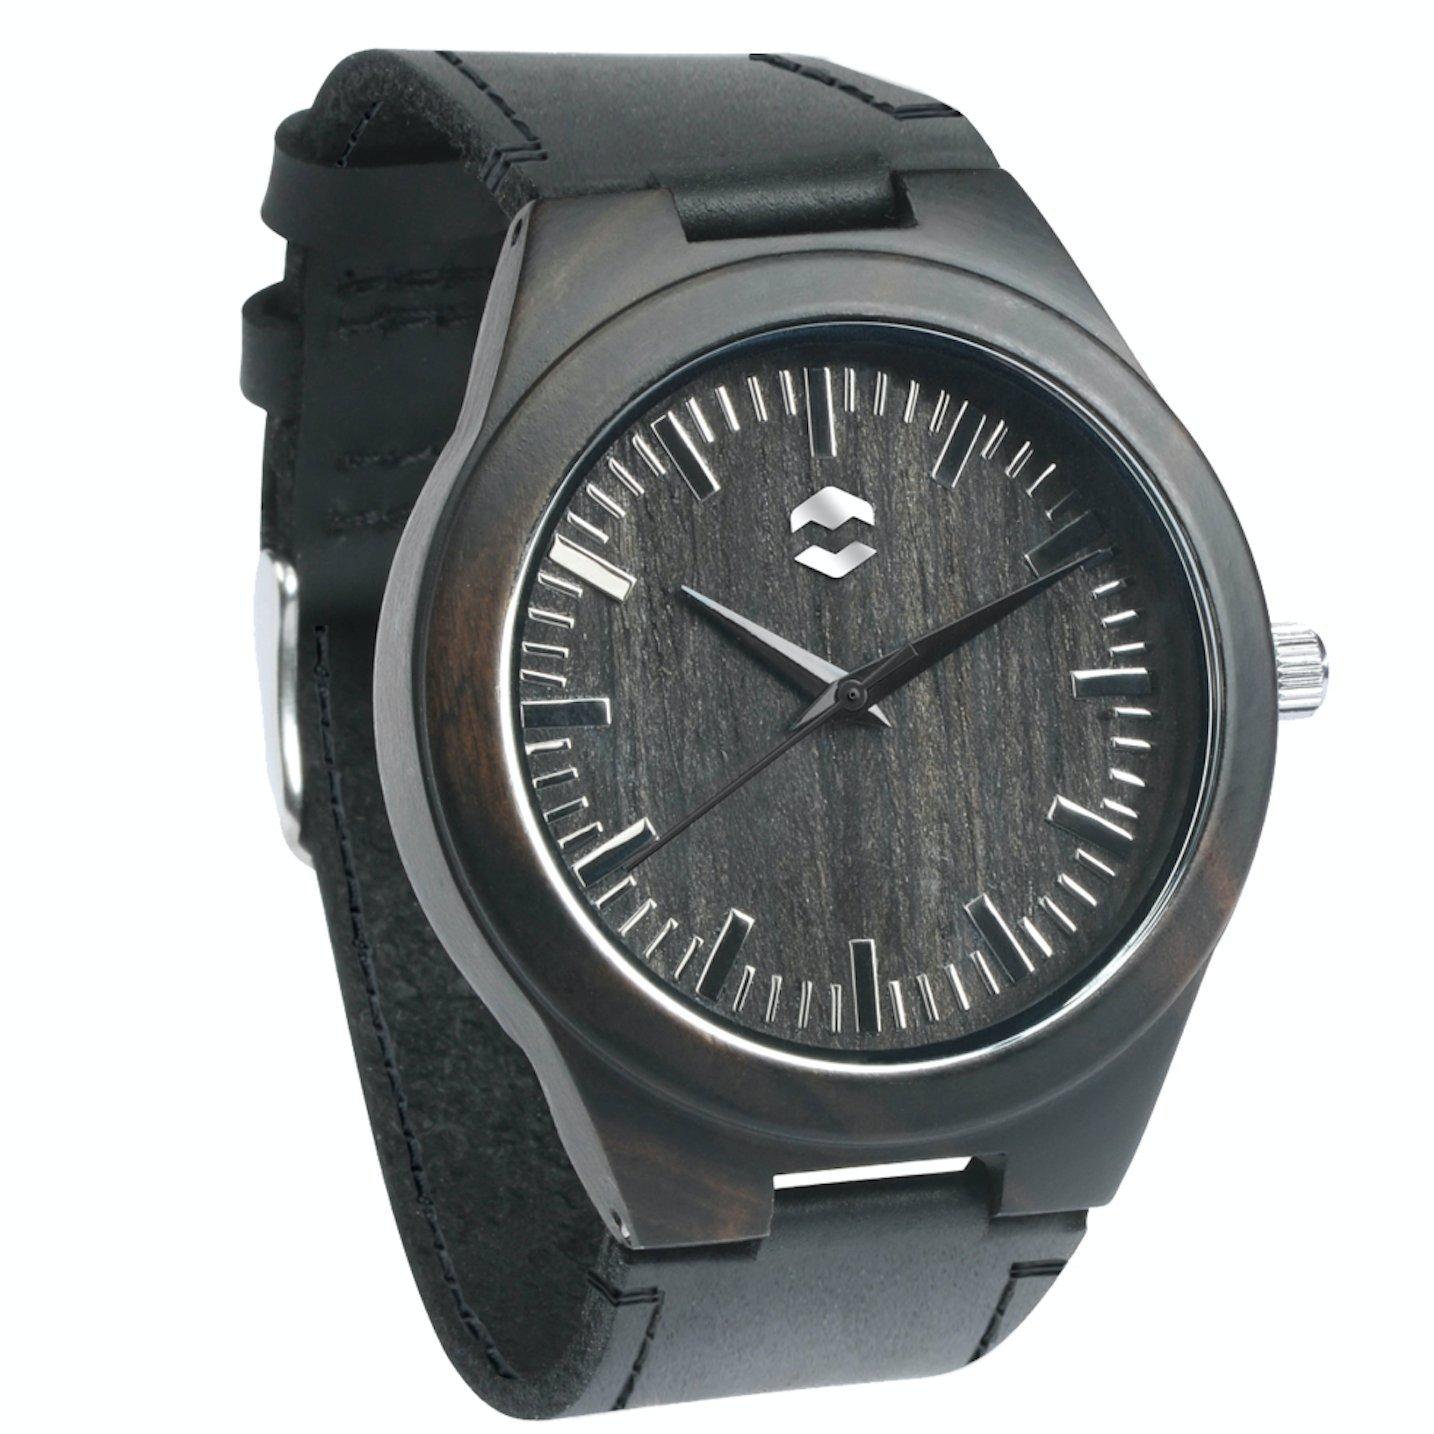 Quantum MMNT Men's Dark Wooden Watch w/Genuine Brown Leather Strap and Japanese Analog Miyota Quartz Movement